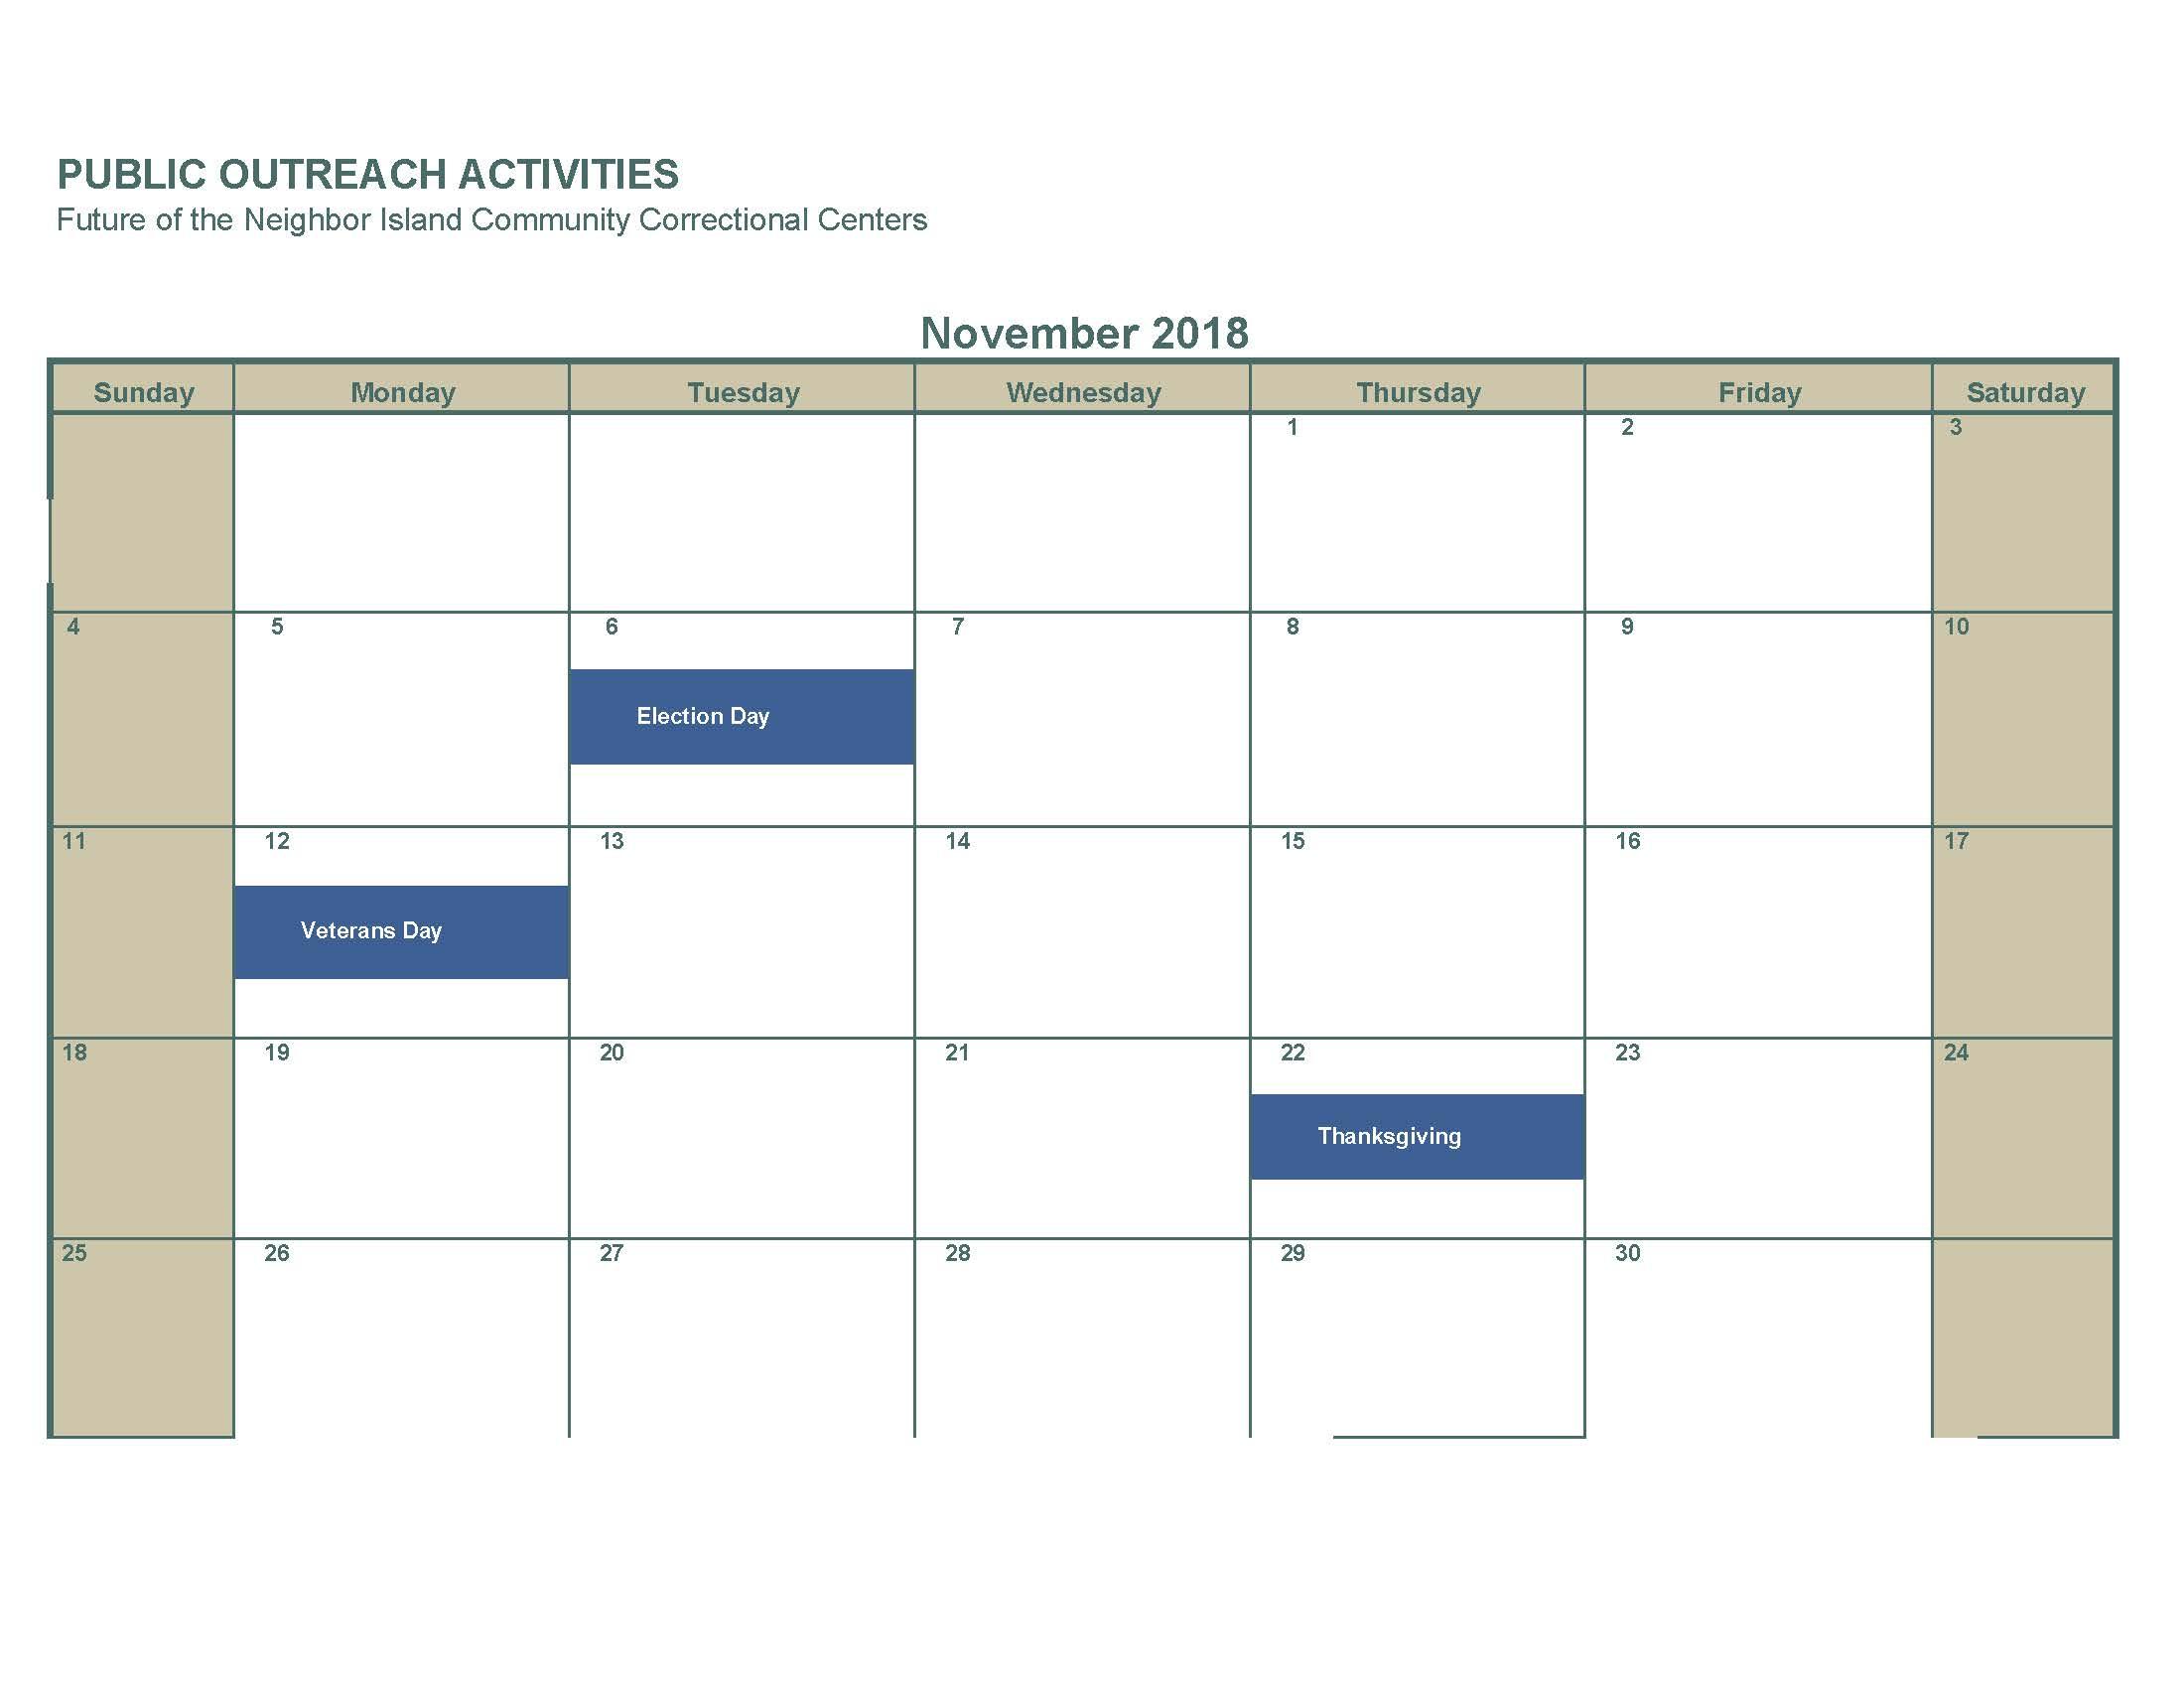 November 2018 No activities